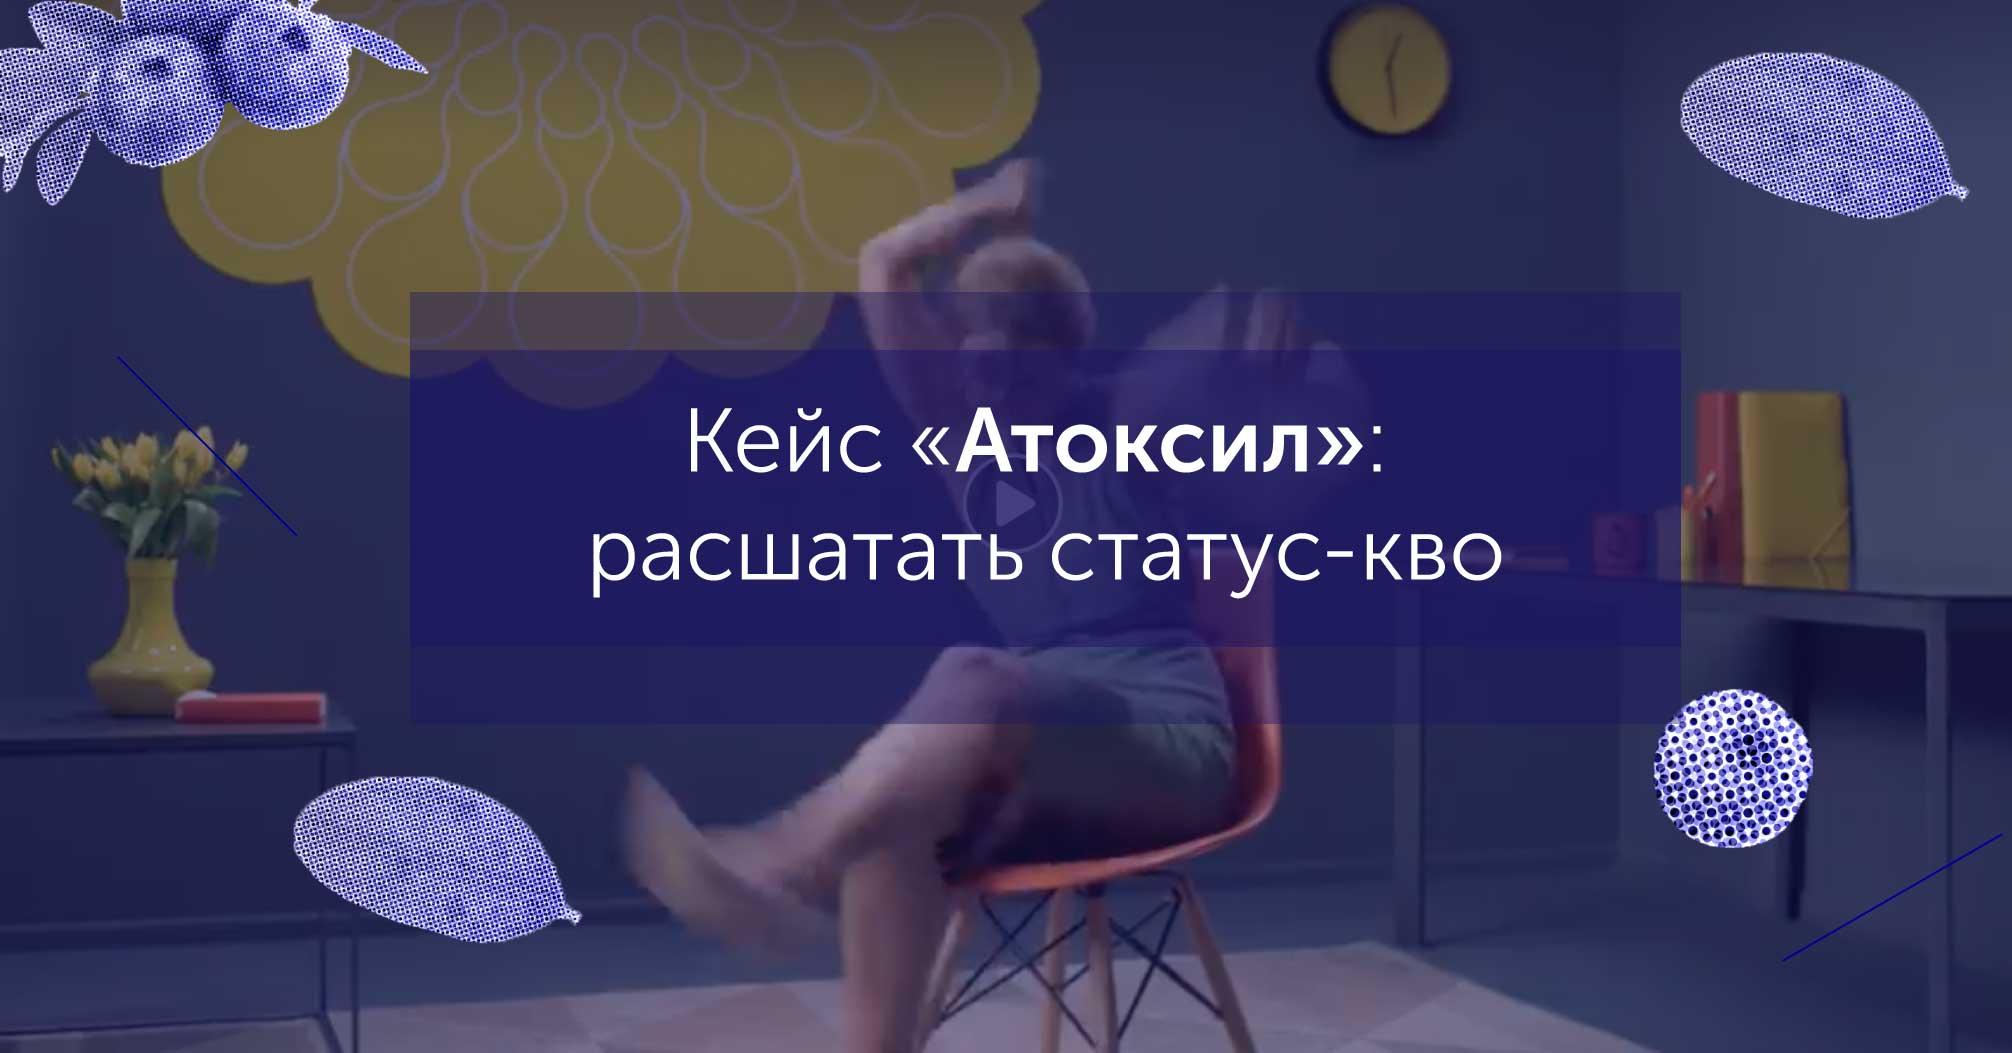 Кейс Атоксила